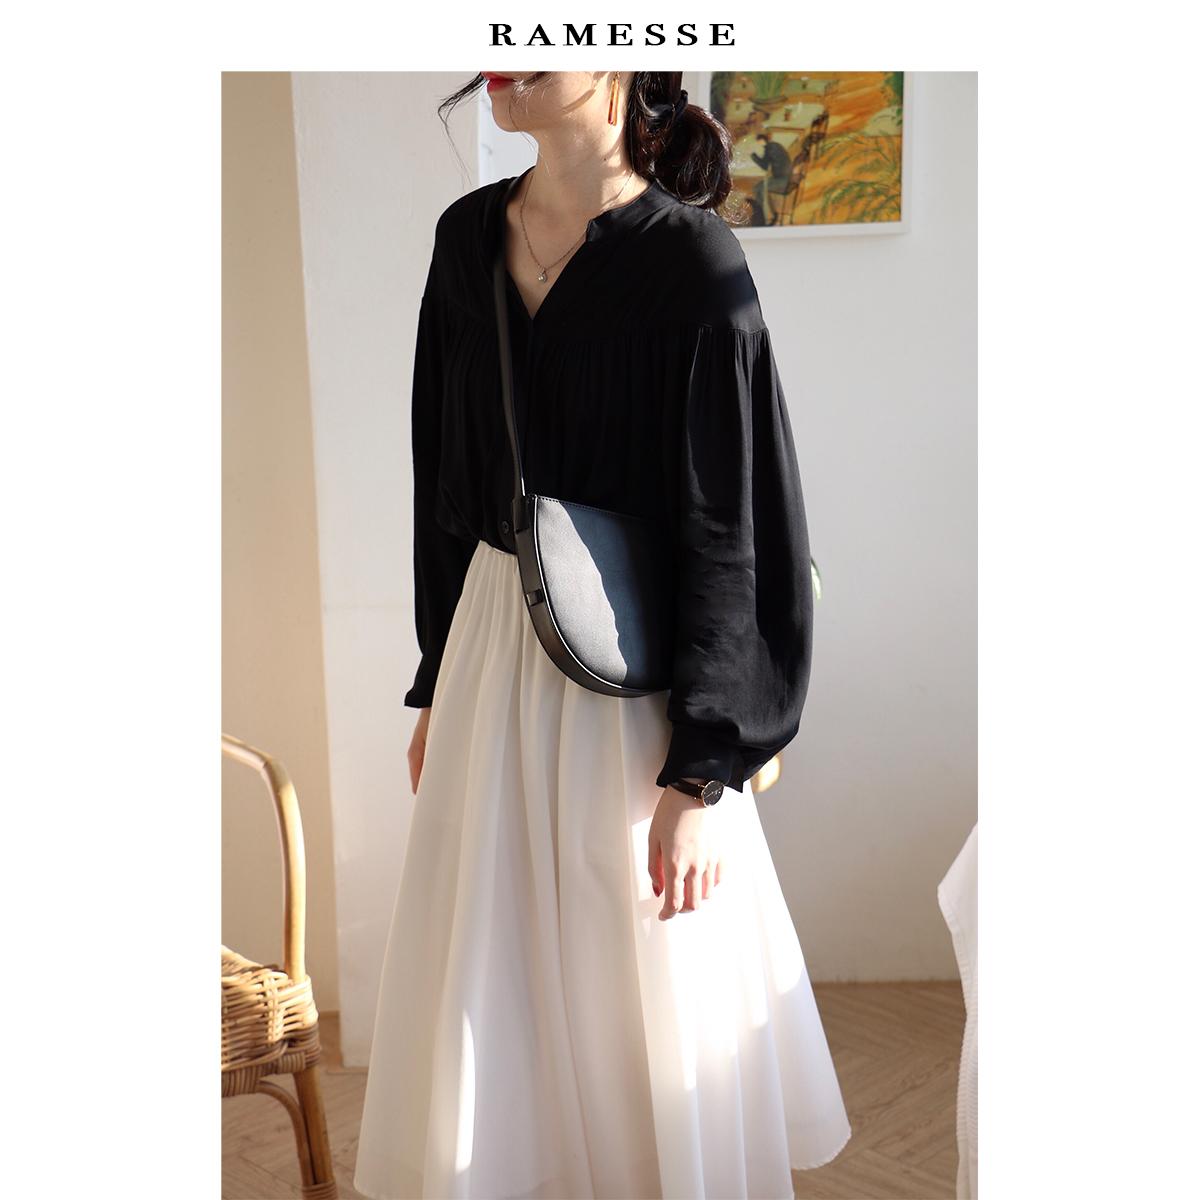 Ramesse   小v领宫廷风温婉黑色衬衫 泡泡袖衬衣女设计感上衣早秋